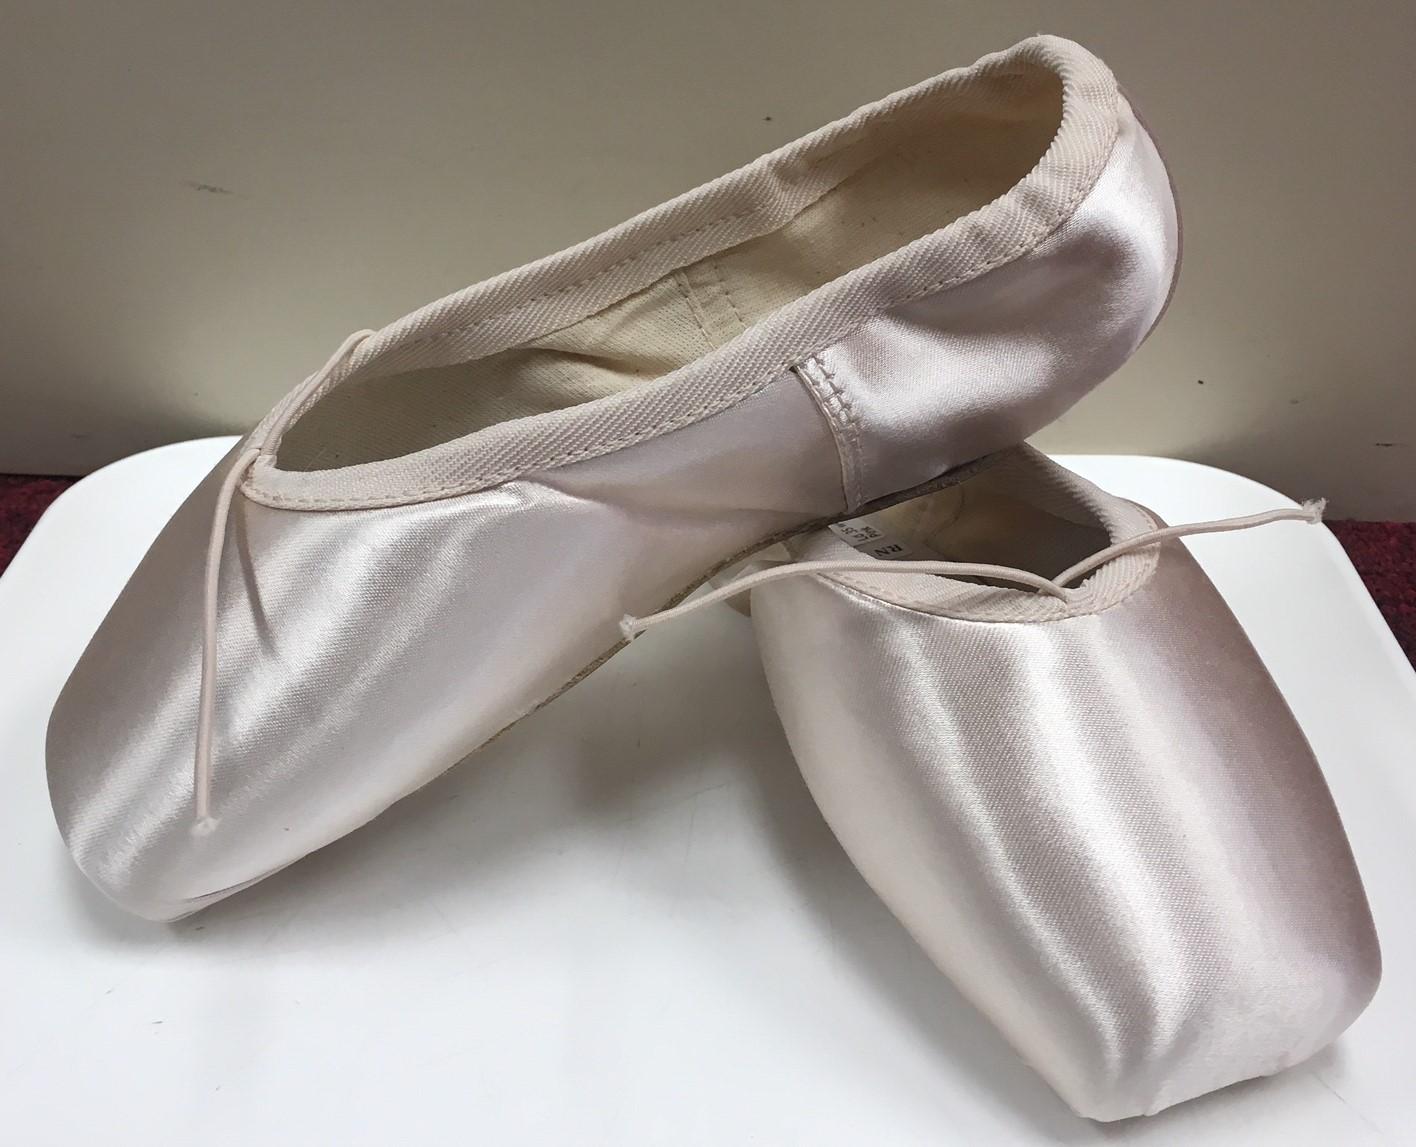 Russian Pointe Lumina Pointe Shoes with Flexible Medium Shank Medium Vamp